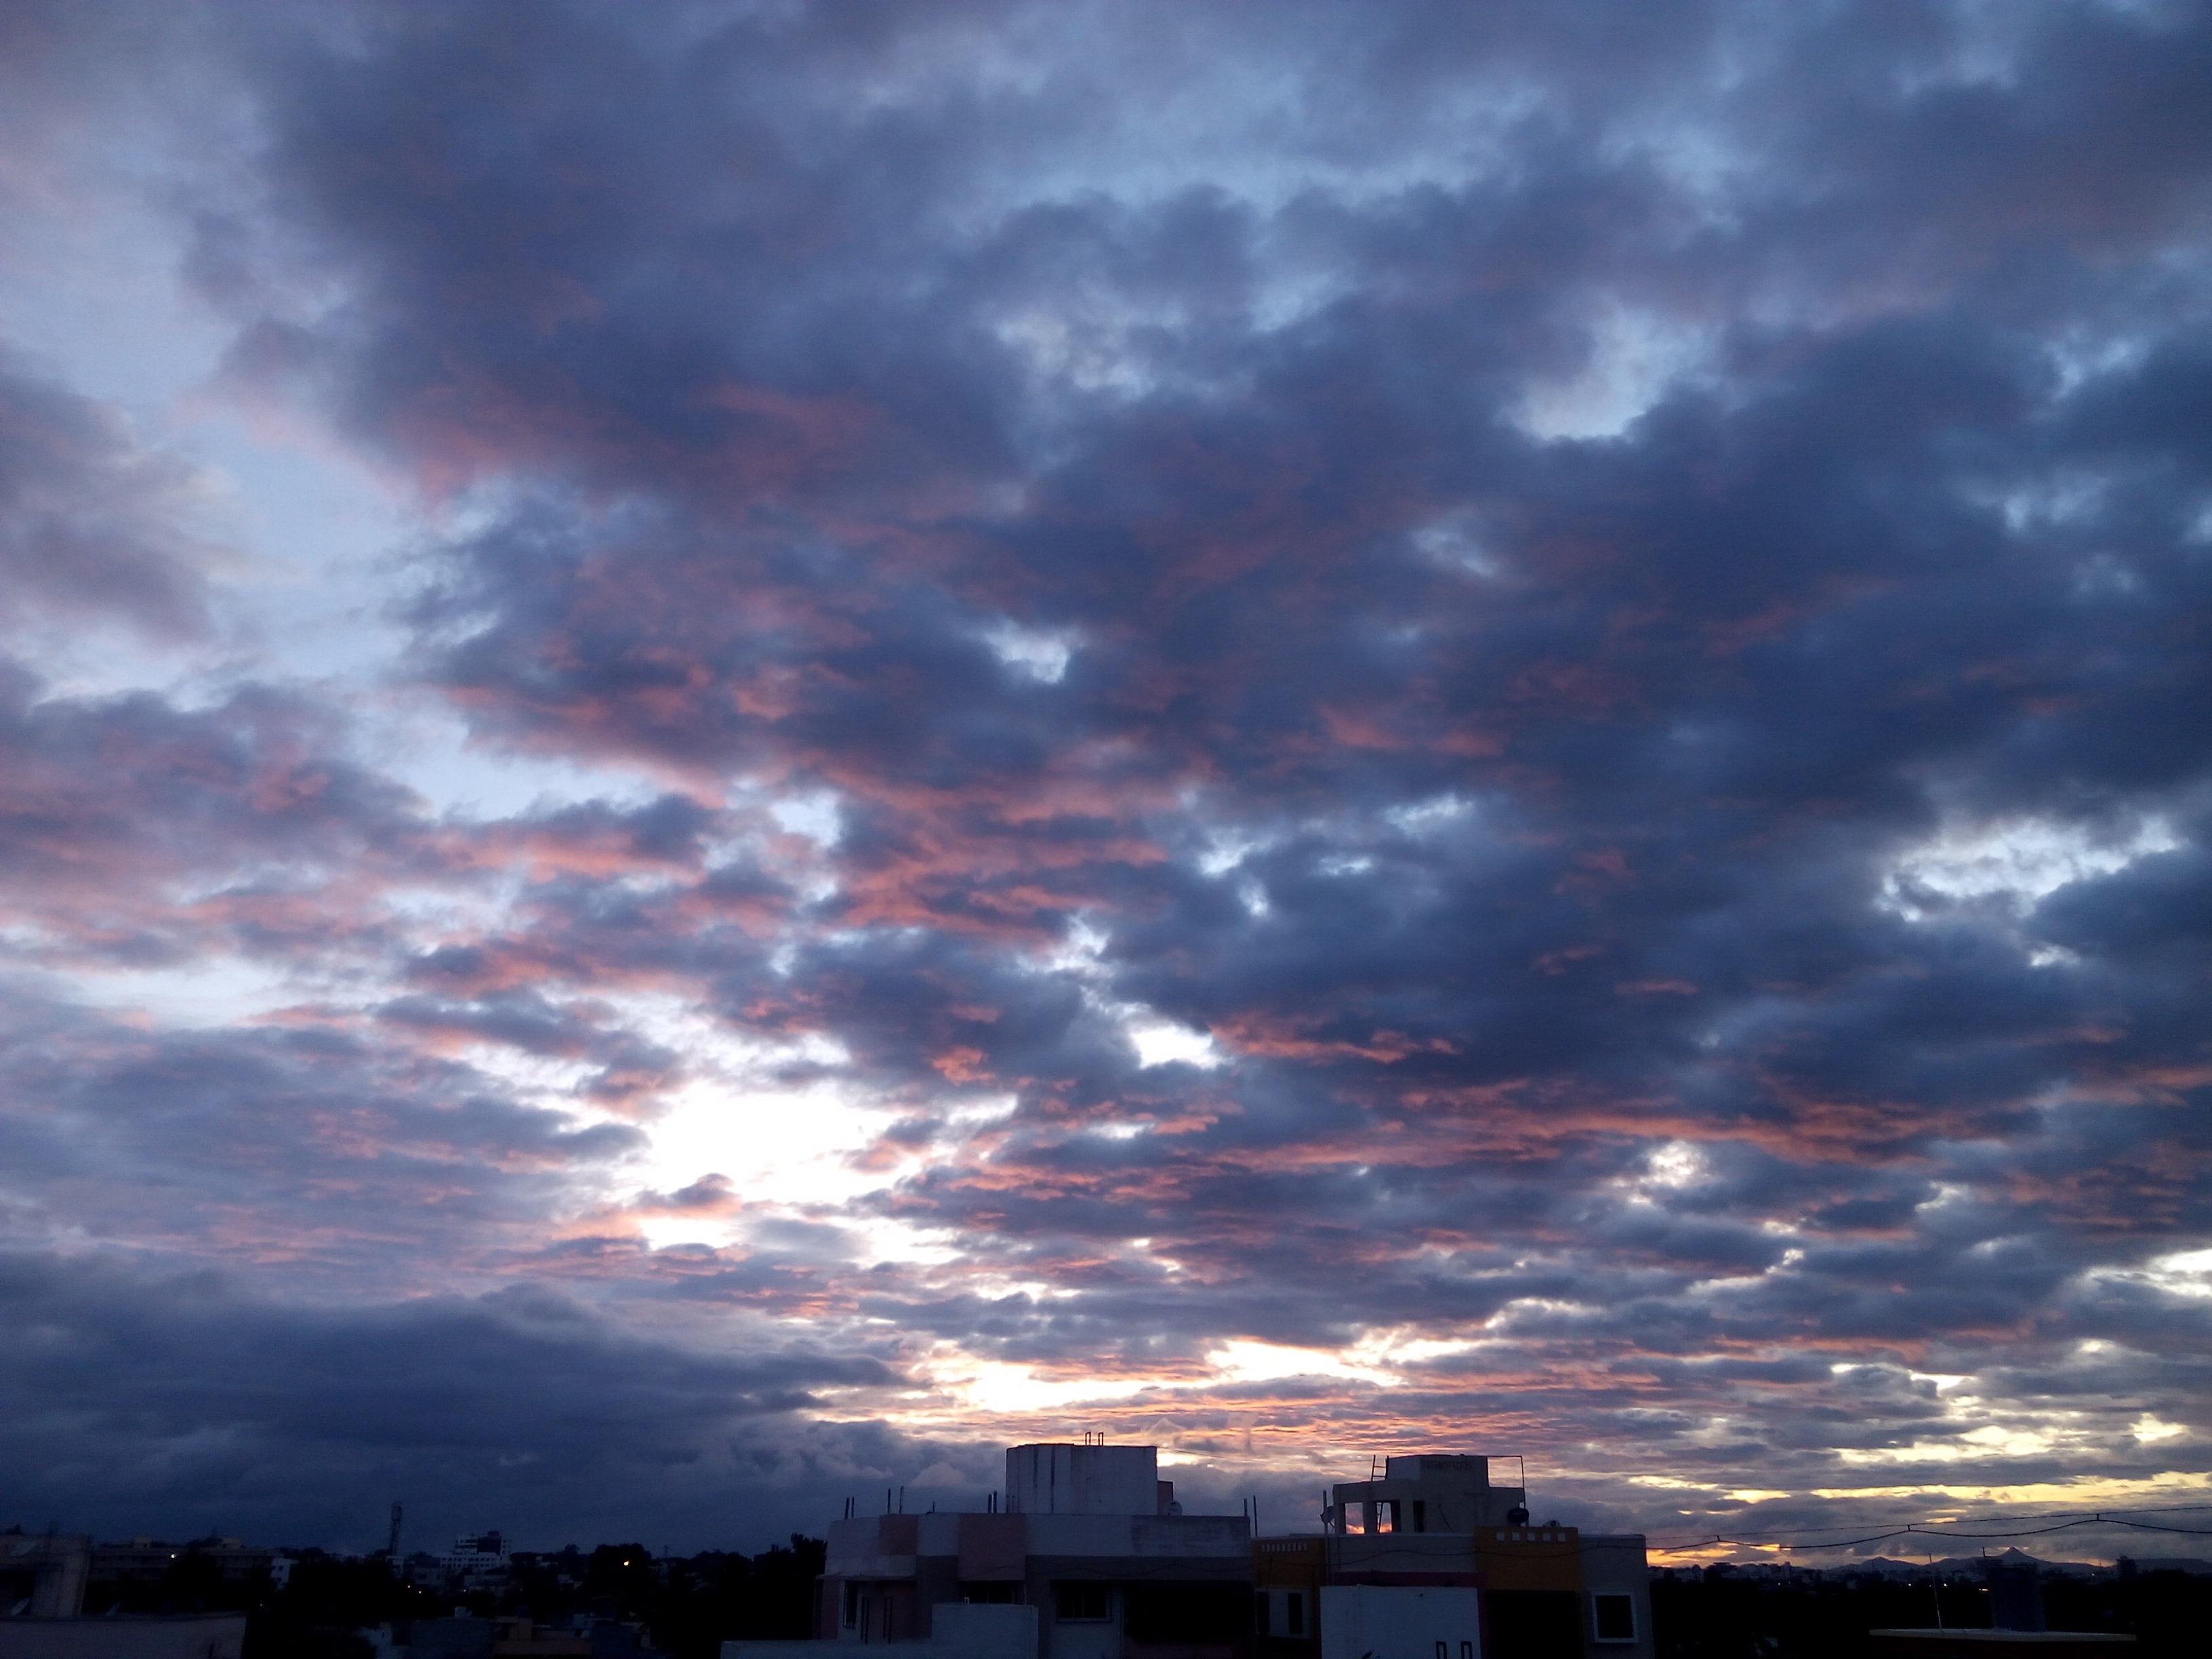 File:Cloudy weather,nashik.jpg - Wikimedia Commons